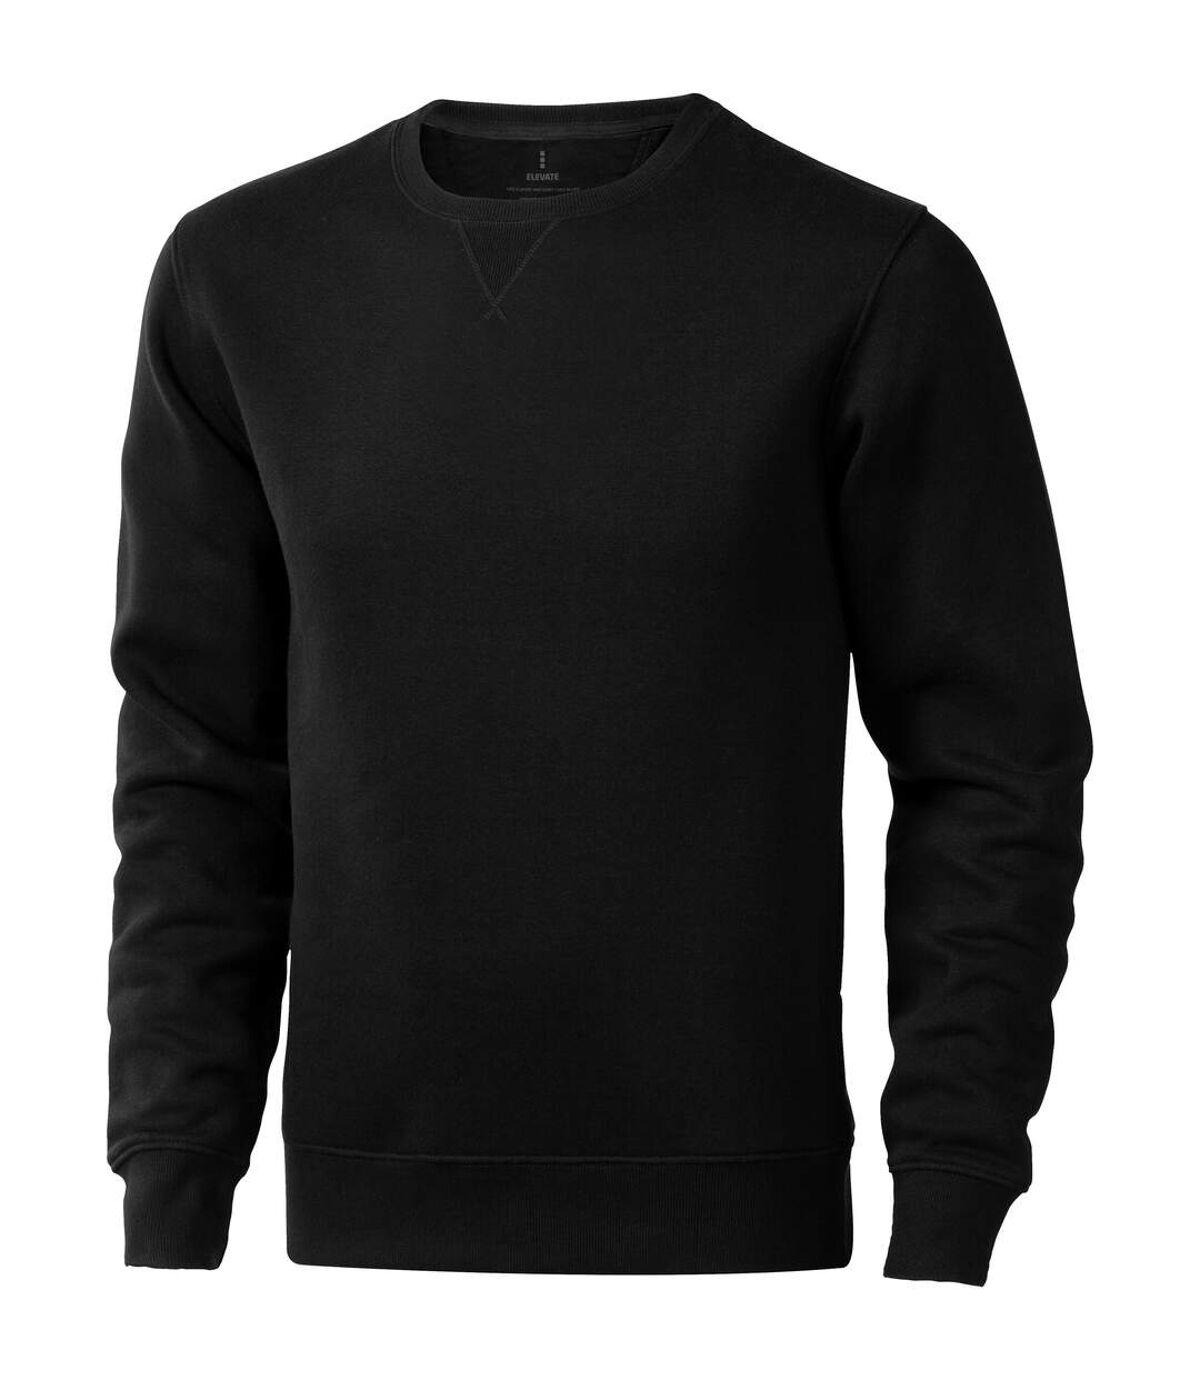 Elevate Mens Surrey Crew Neck Sweater (Solid Black) - UTPF1849